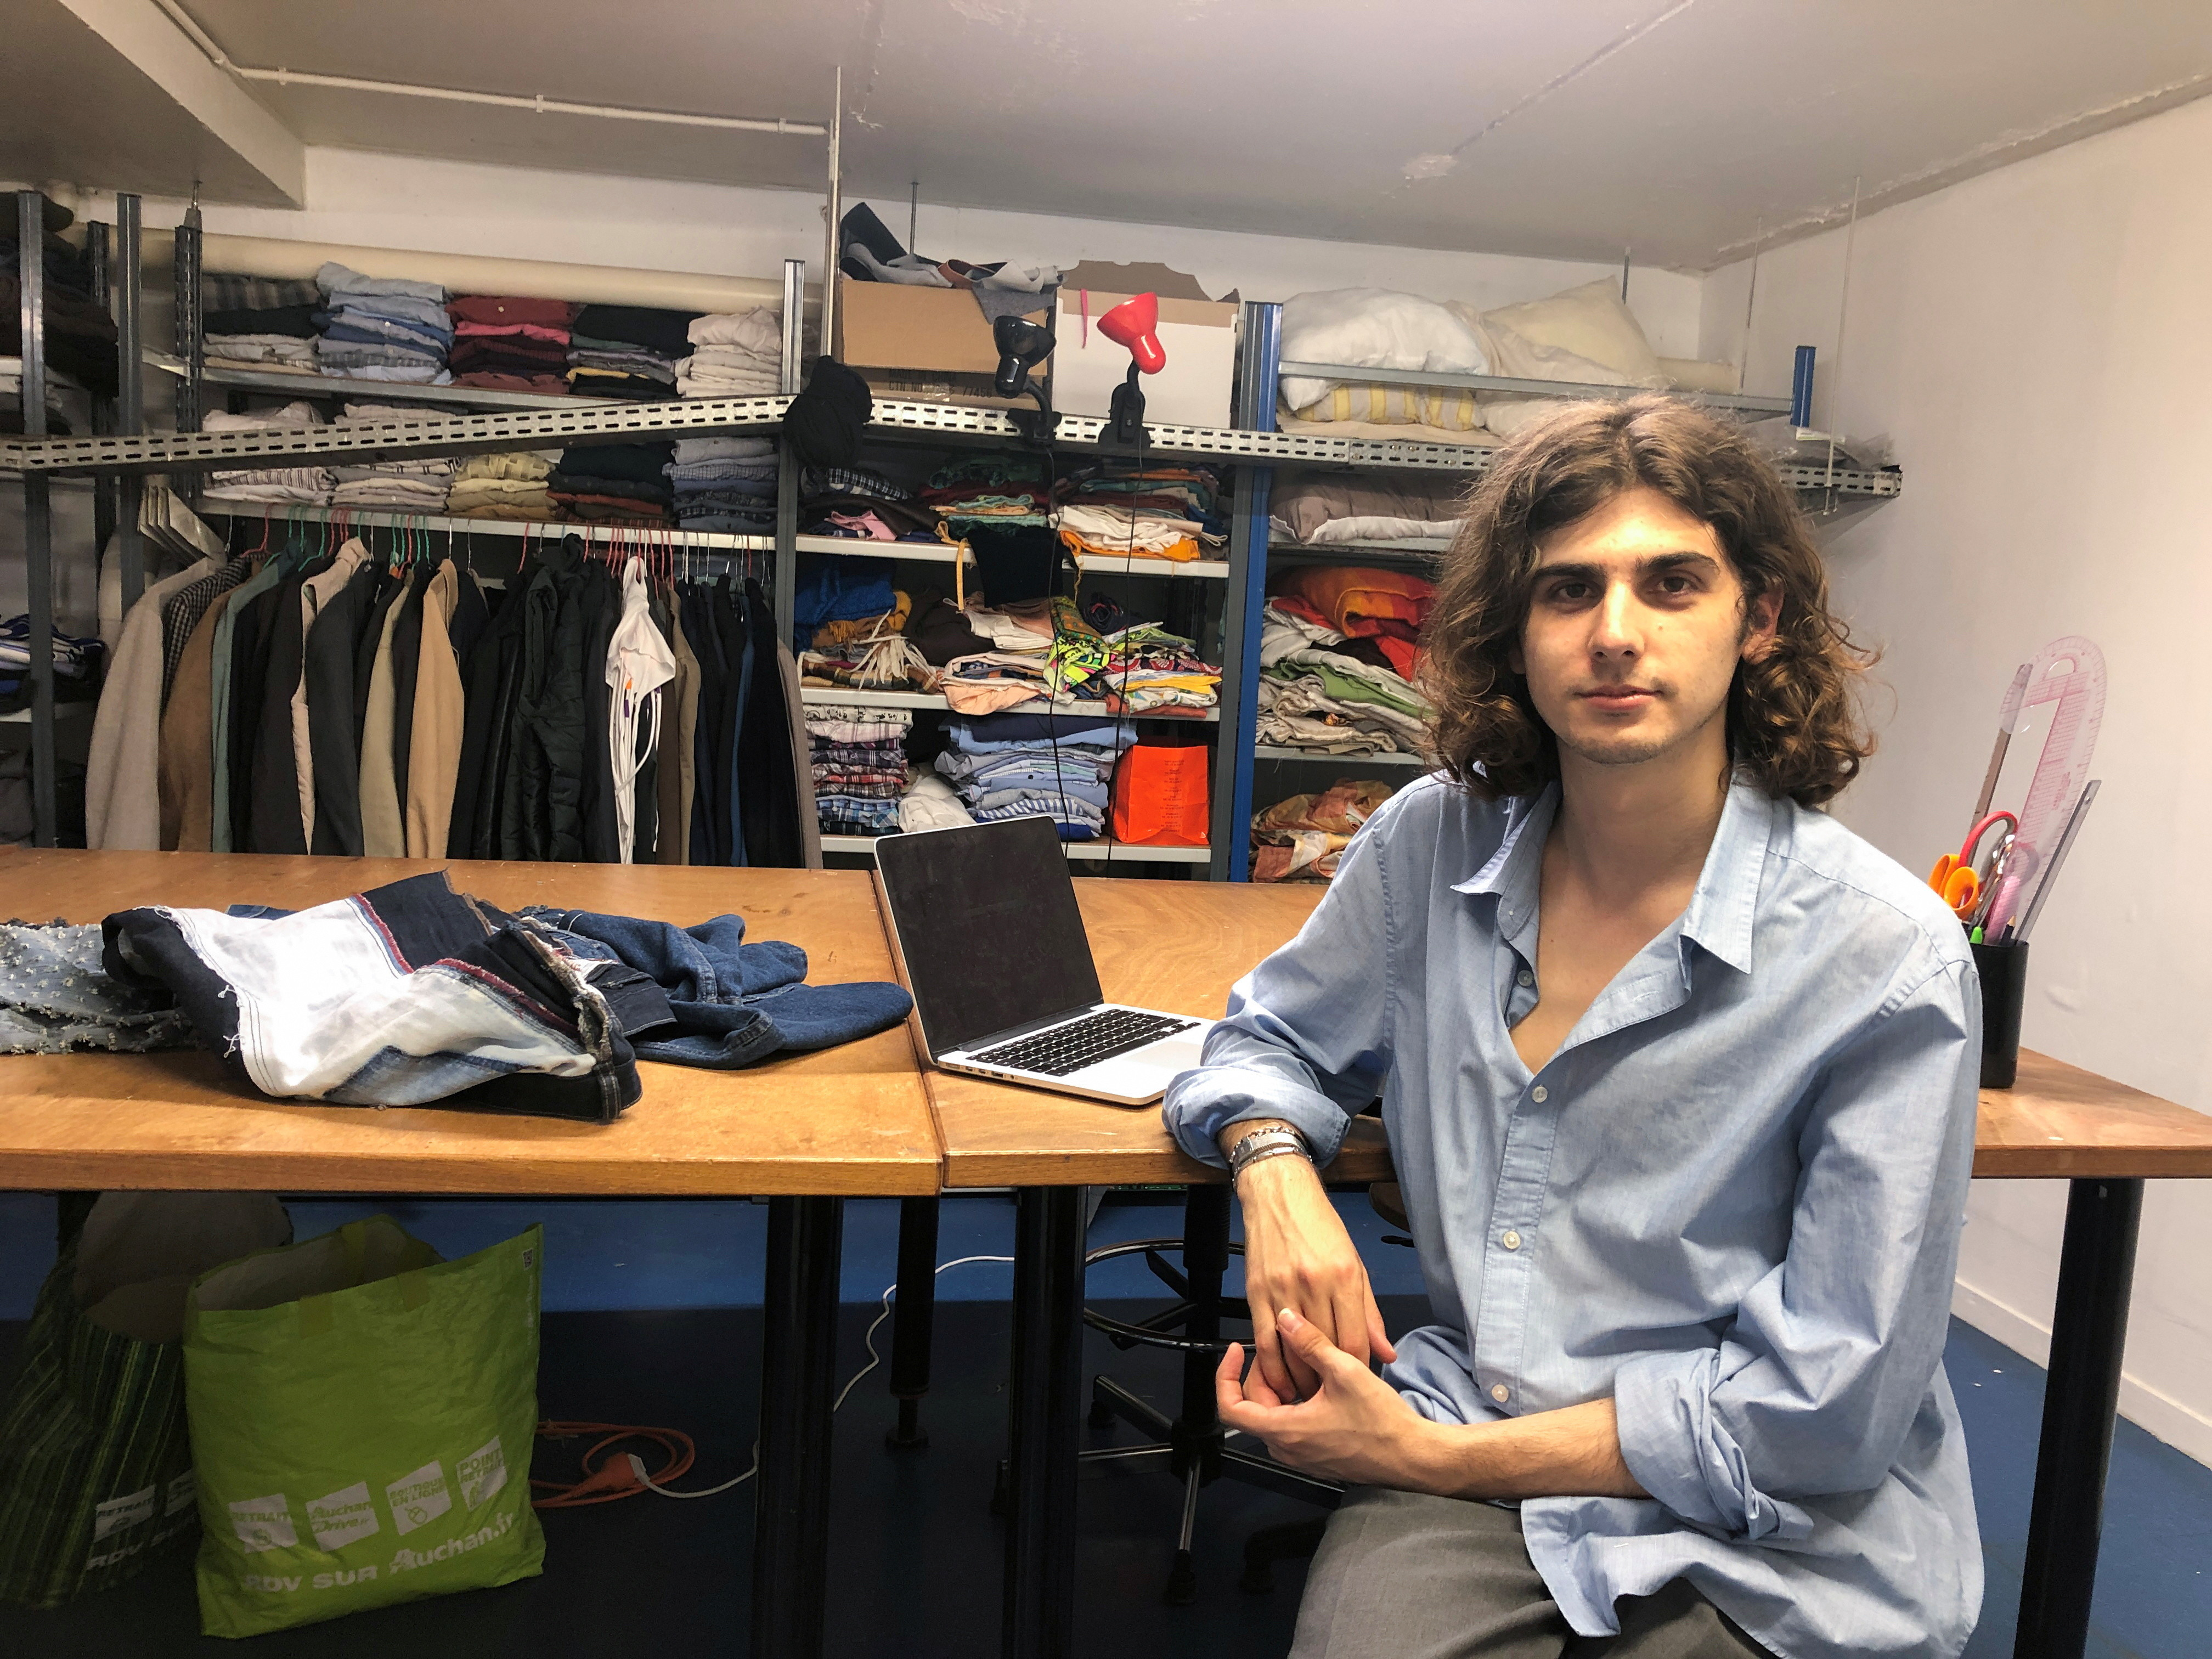 Fashion design student Hugo Castejon-Blanchard from the Institut Francais de la Mode, is seen at a workshop in Antony, near Paris, France.